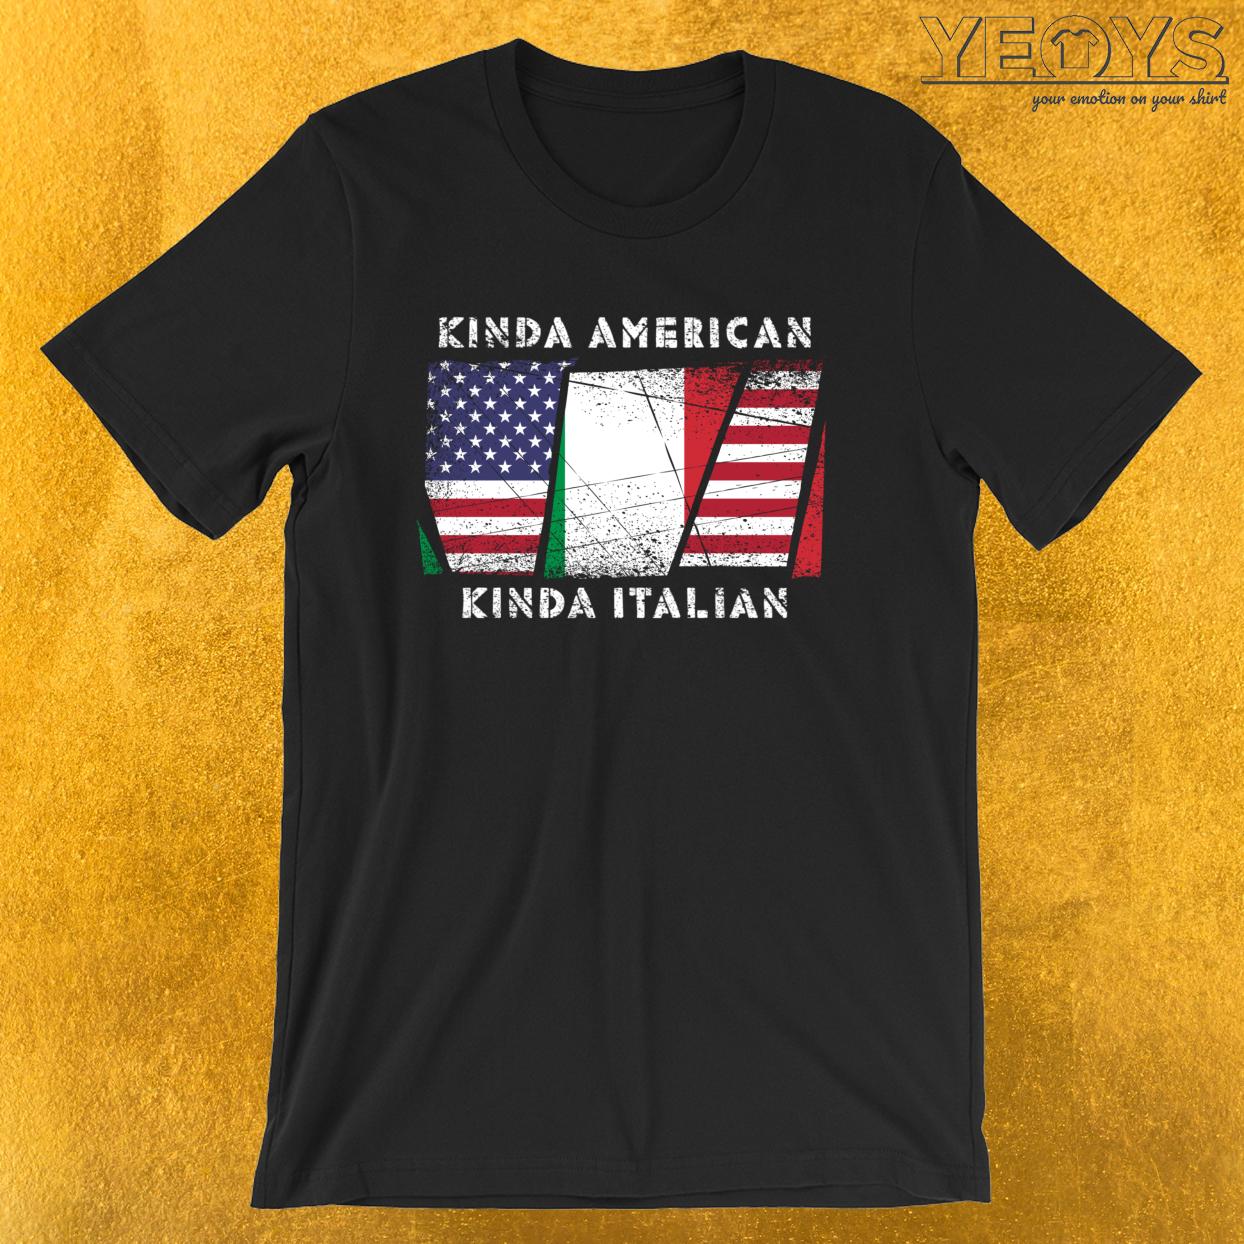 Kinda American Kinda Italian – Dual Citizenship Tee